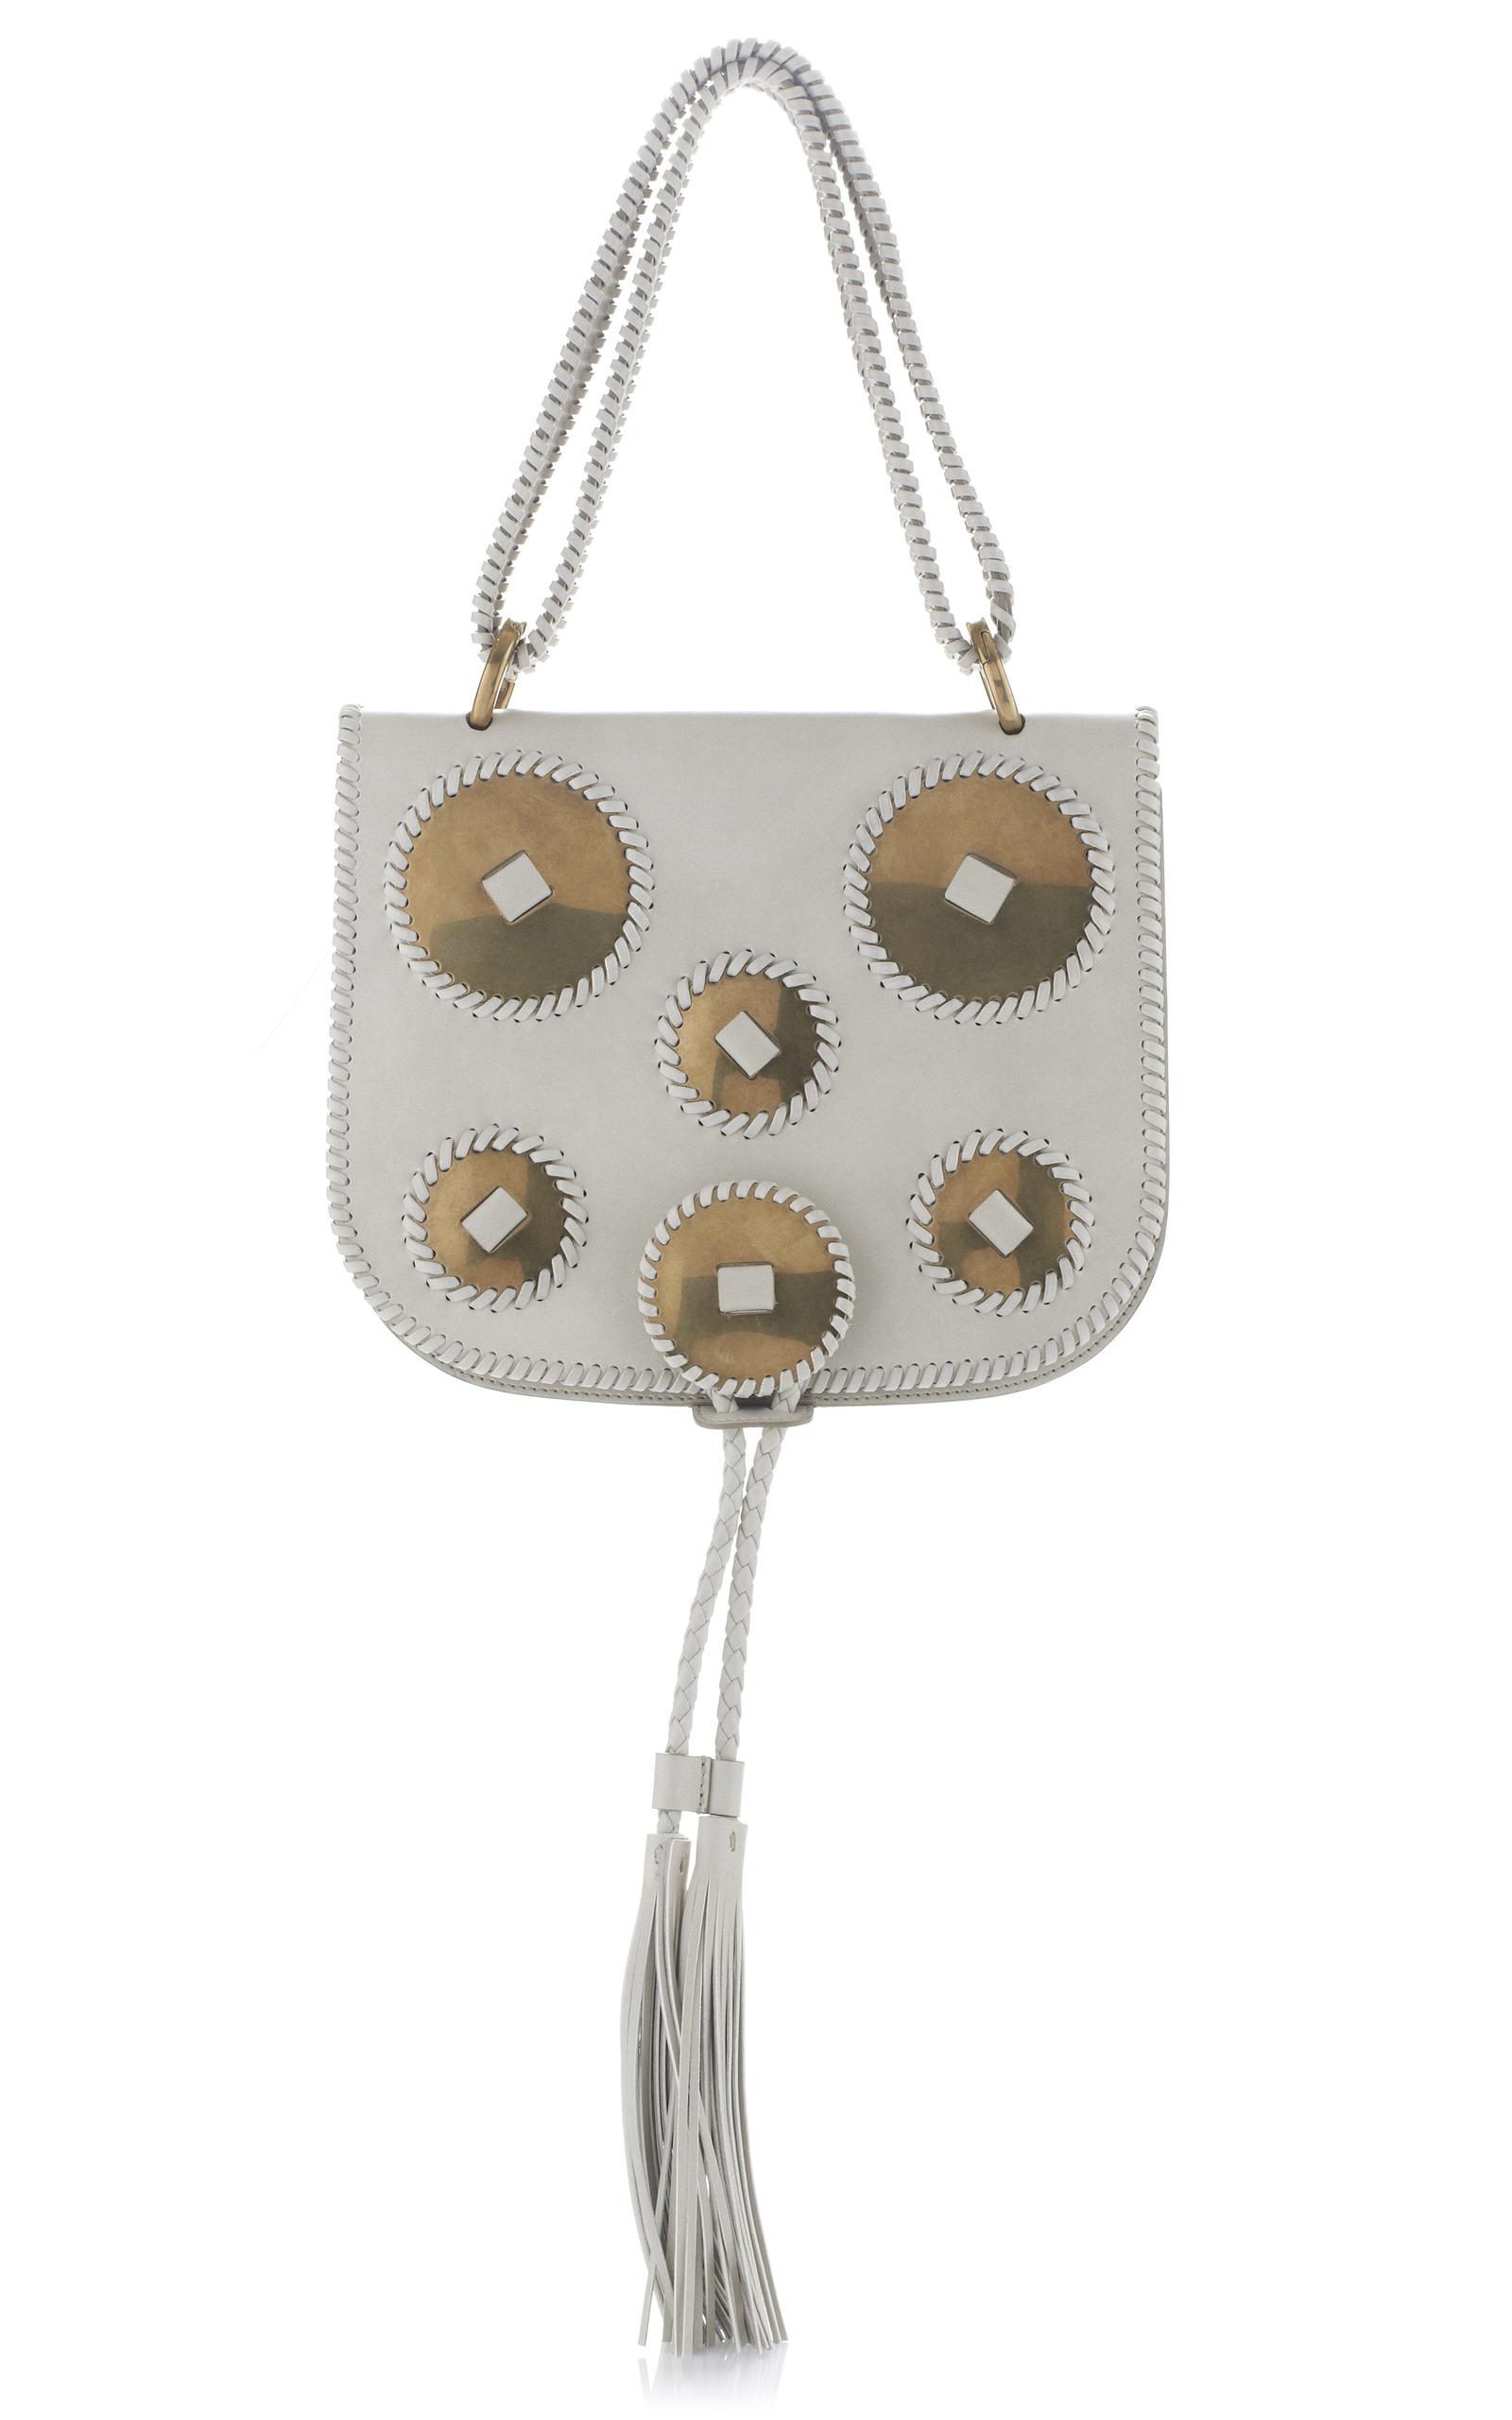 633c1d224c White Kamelia Top Handle Handbag by Salvatore Ferragamo